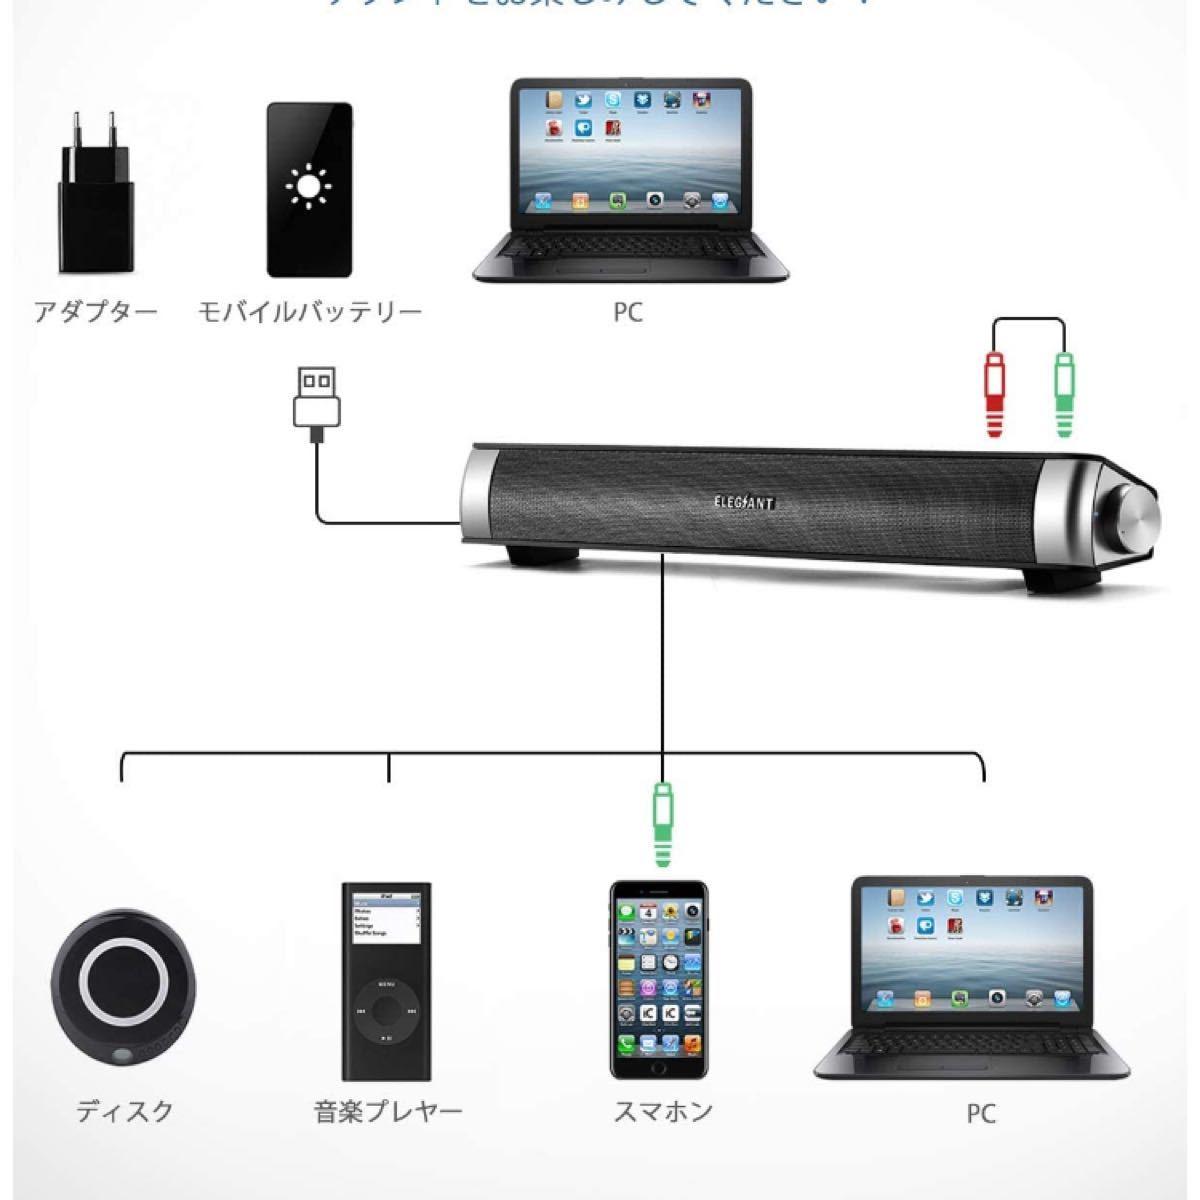 PCスピーカー USB パソコン サウンドバー ステレオ有線給電